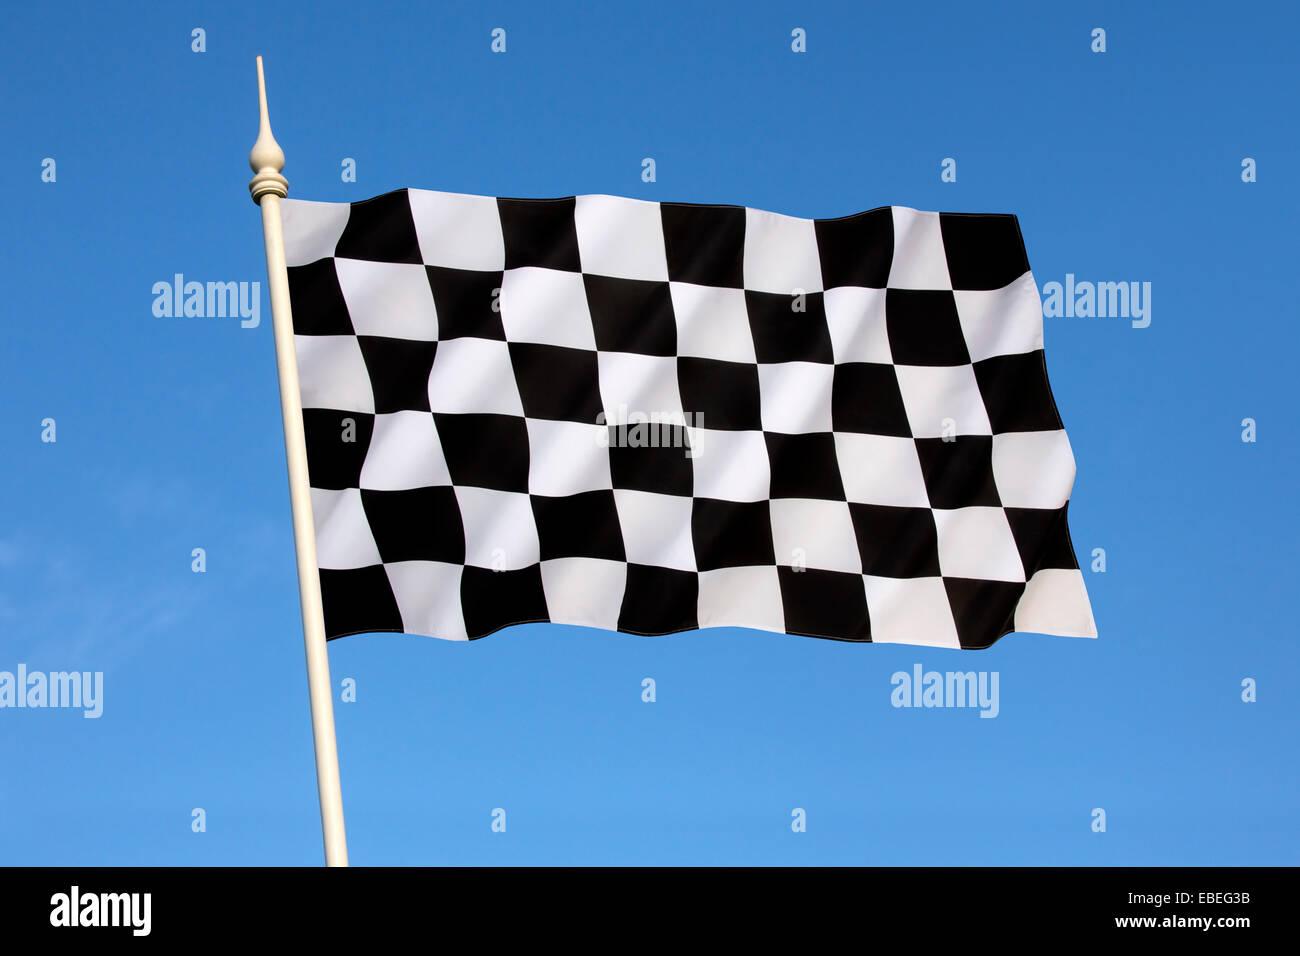 Checkered Flag - Winner - Winning - Stock Image